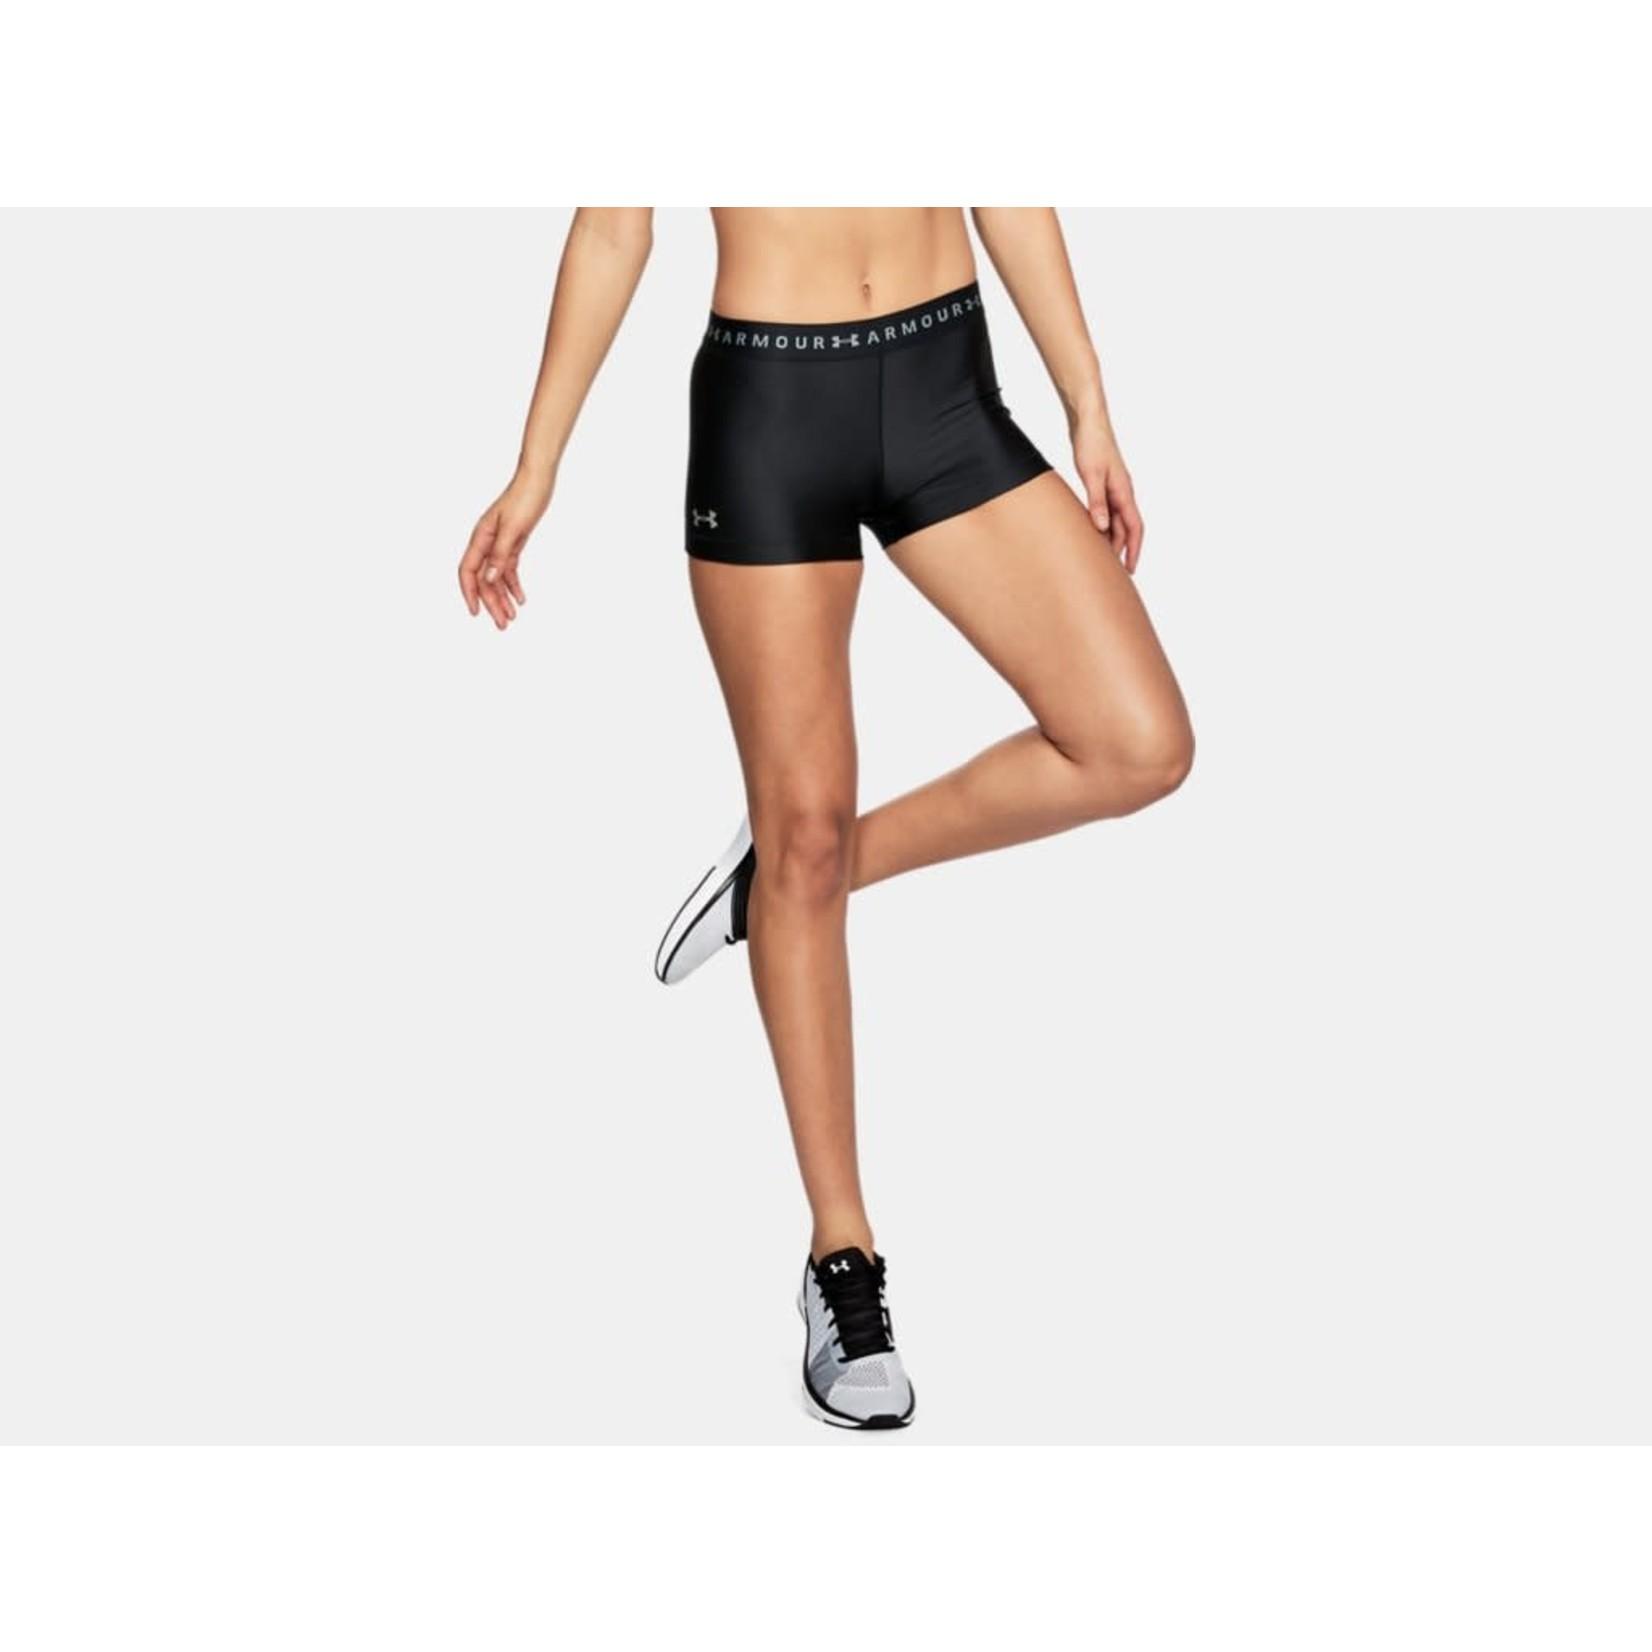 Under Armour Under Armour Shorts, HG Armour Shorty, Heat Gear, Compression, Ladies